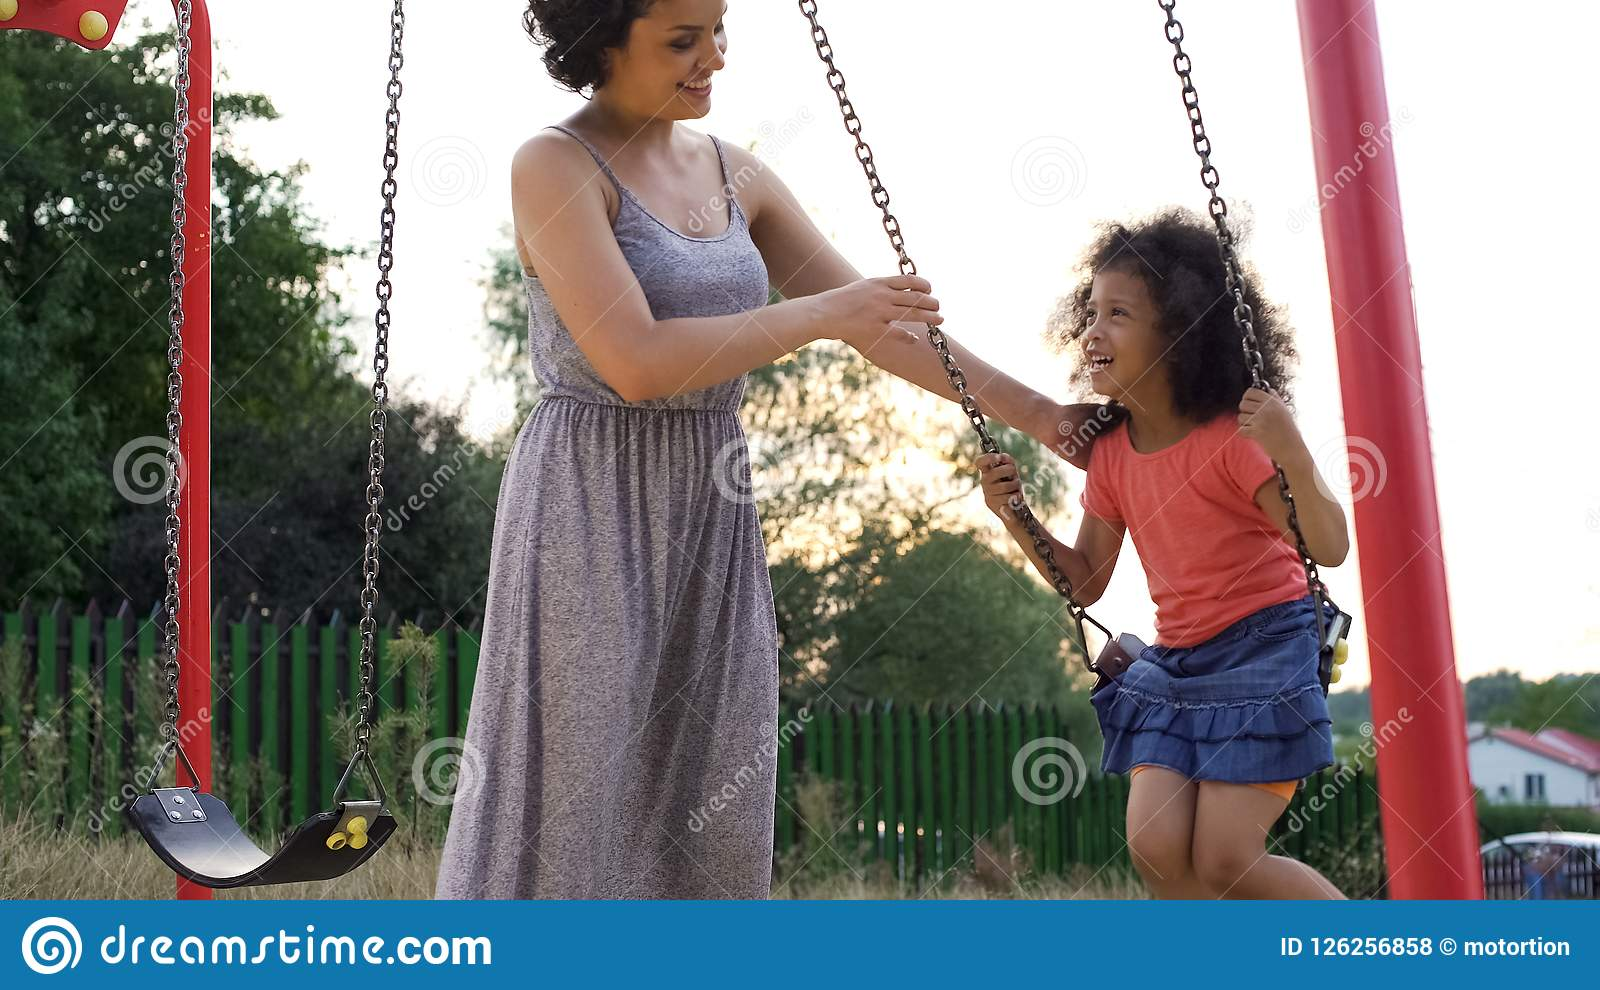 Beautiful smiling mother in grey dress swinging her favorite giggling daughter